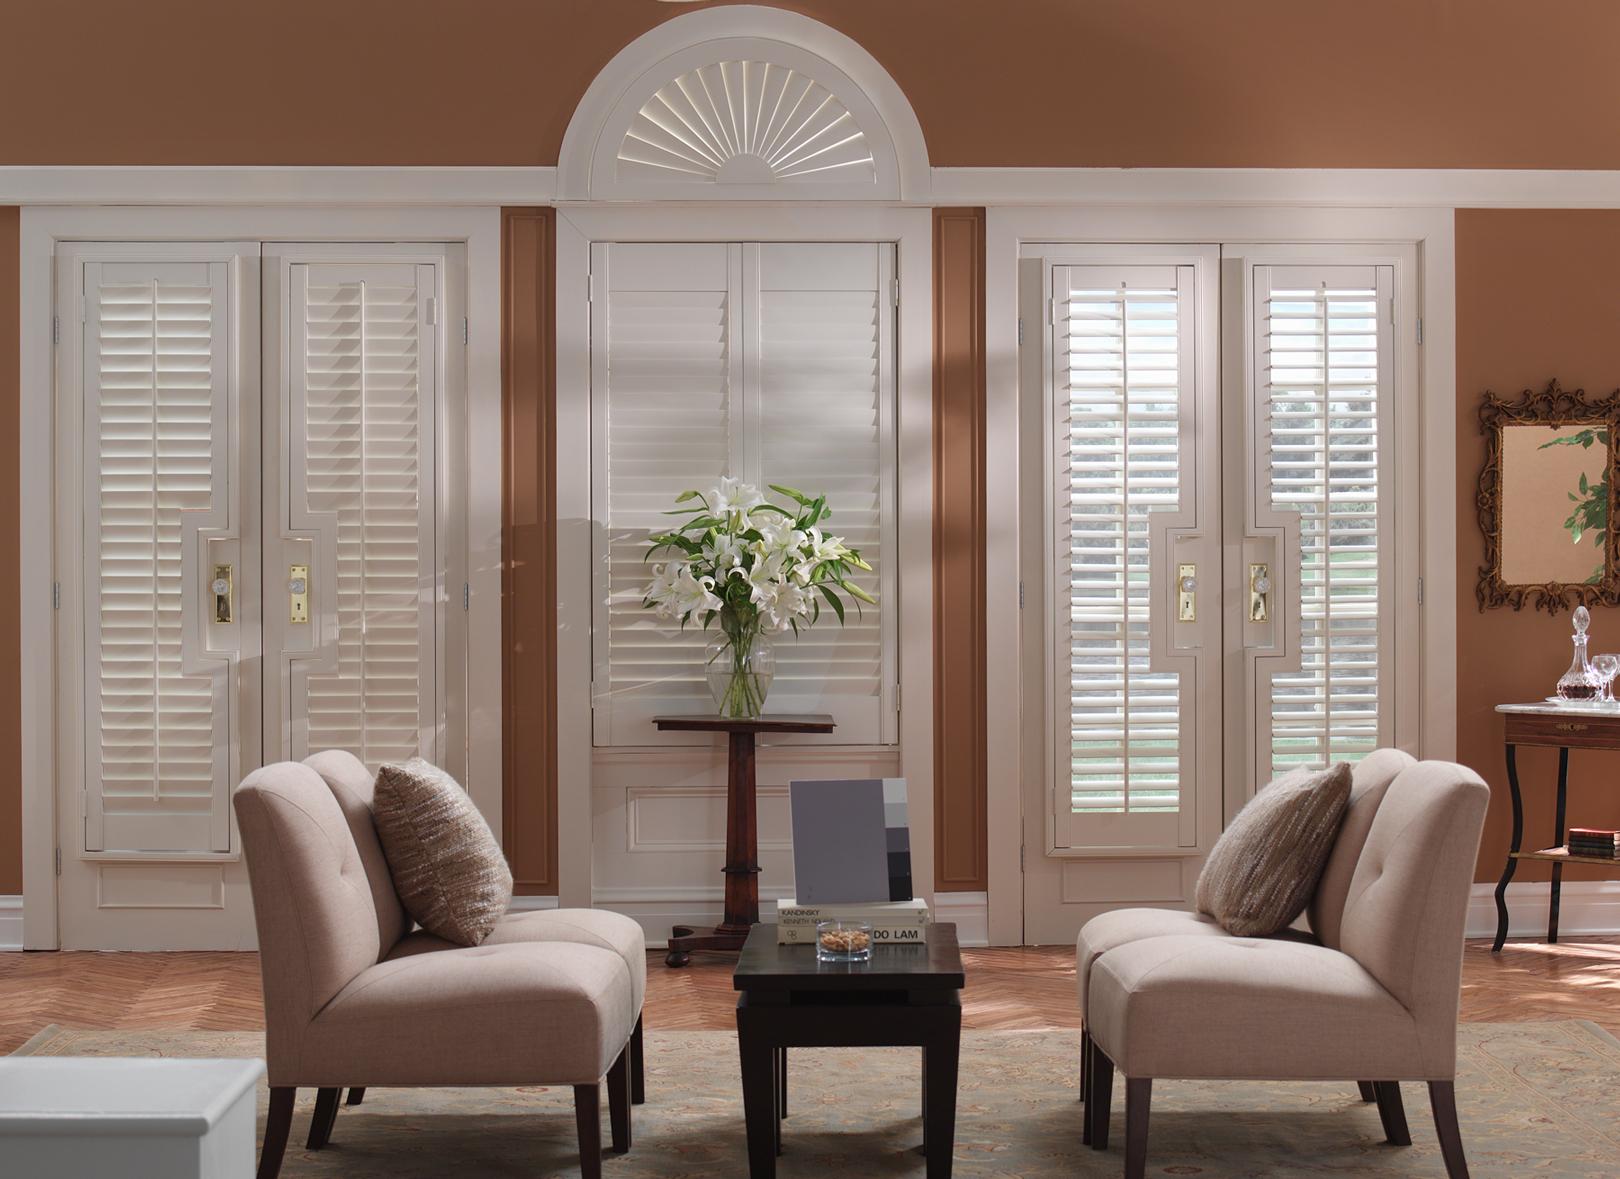 images of window treatments farmhouse bella window treatments8 treatments brownstoner